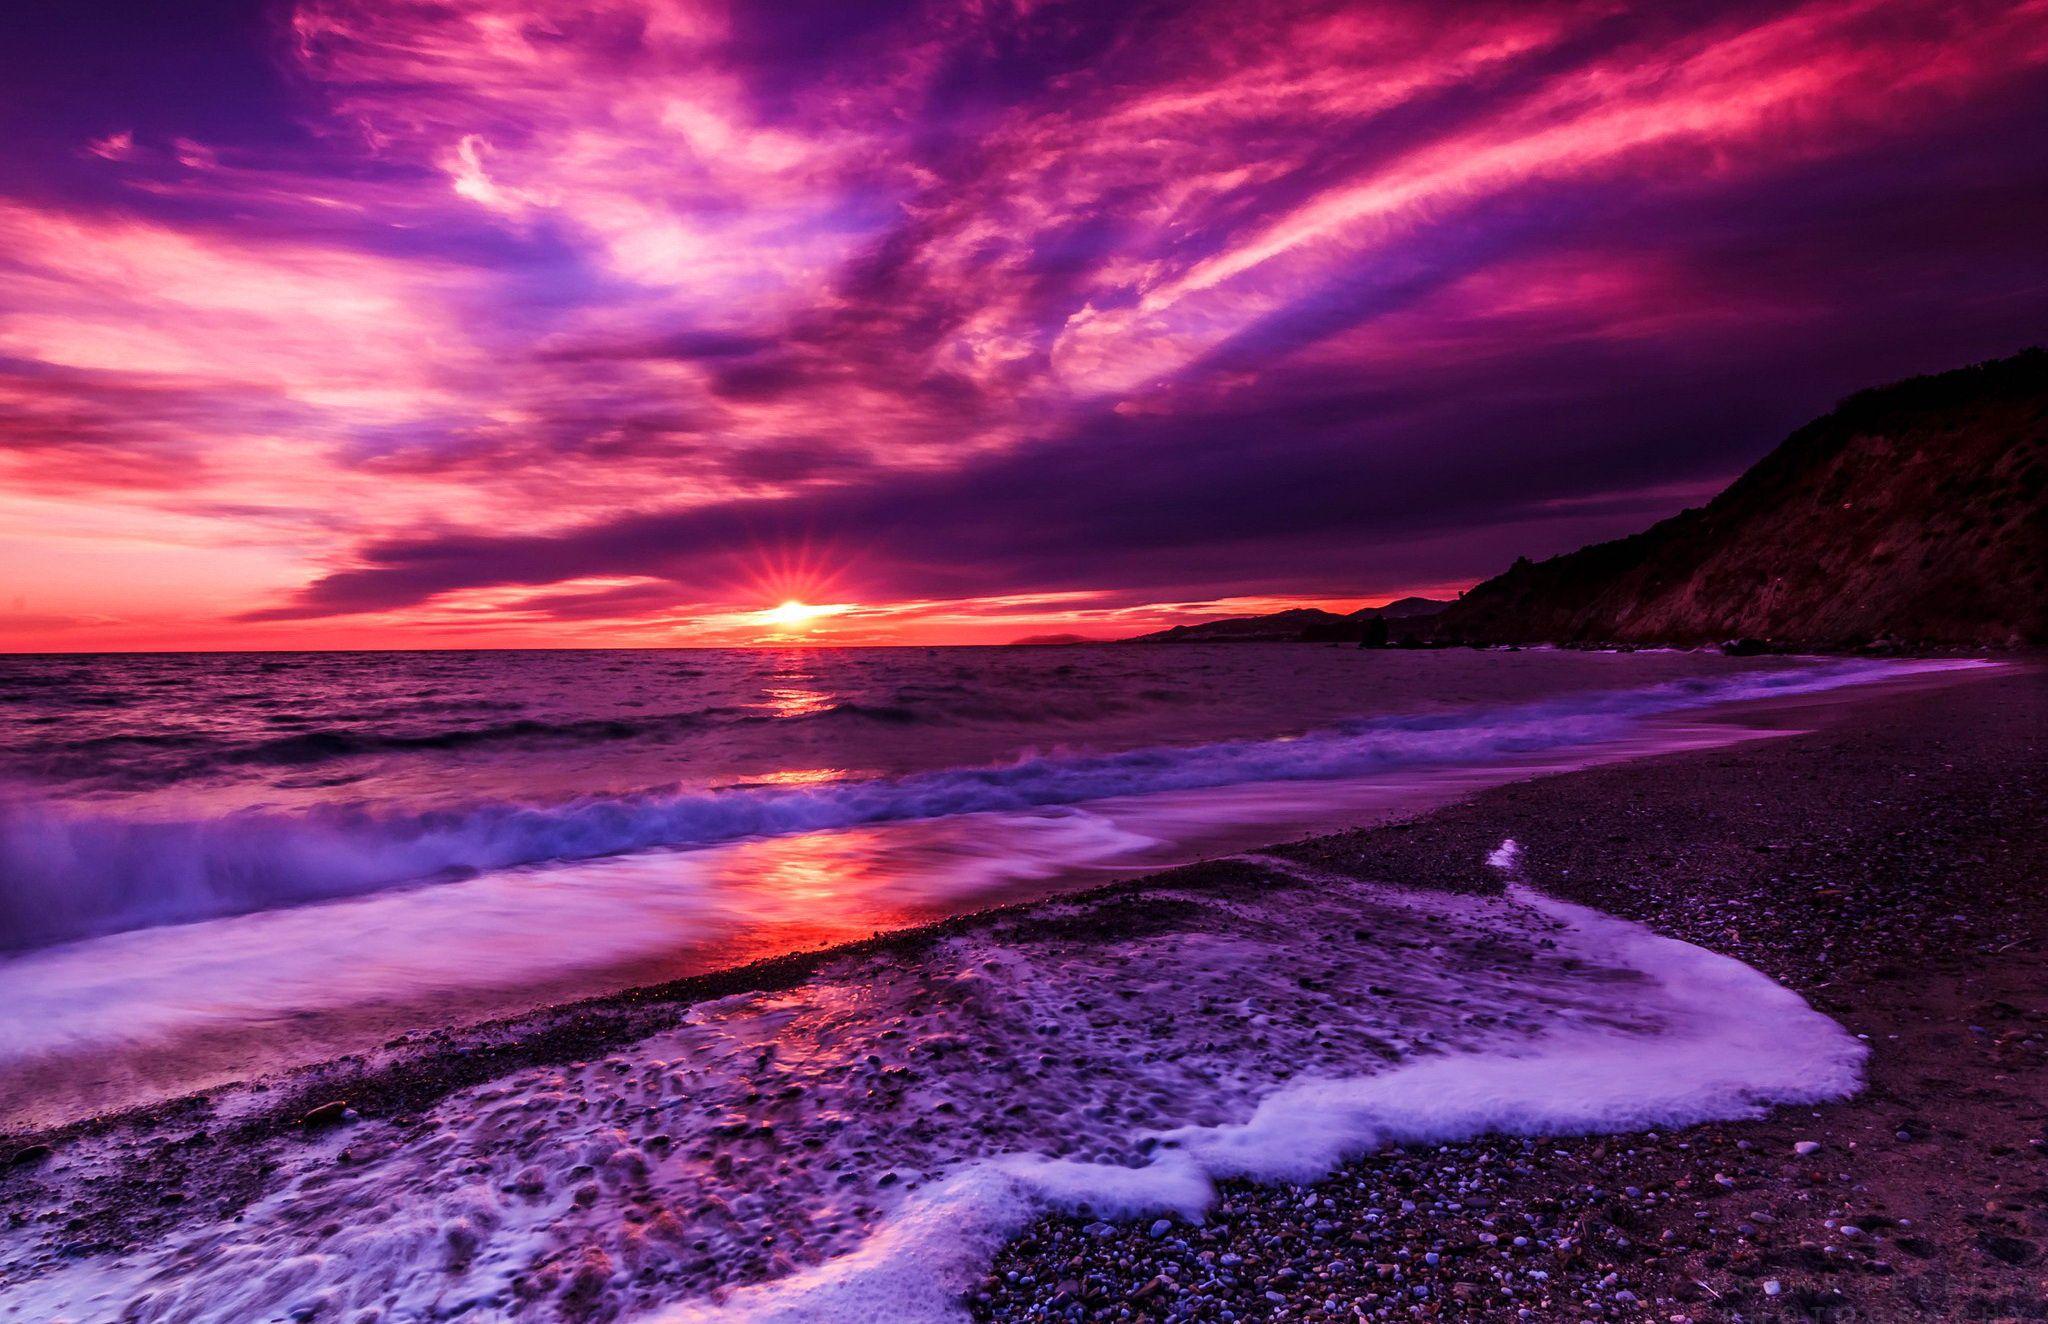 Purple sea Oceans Nature Background Wallpapers on Desktop